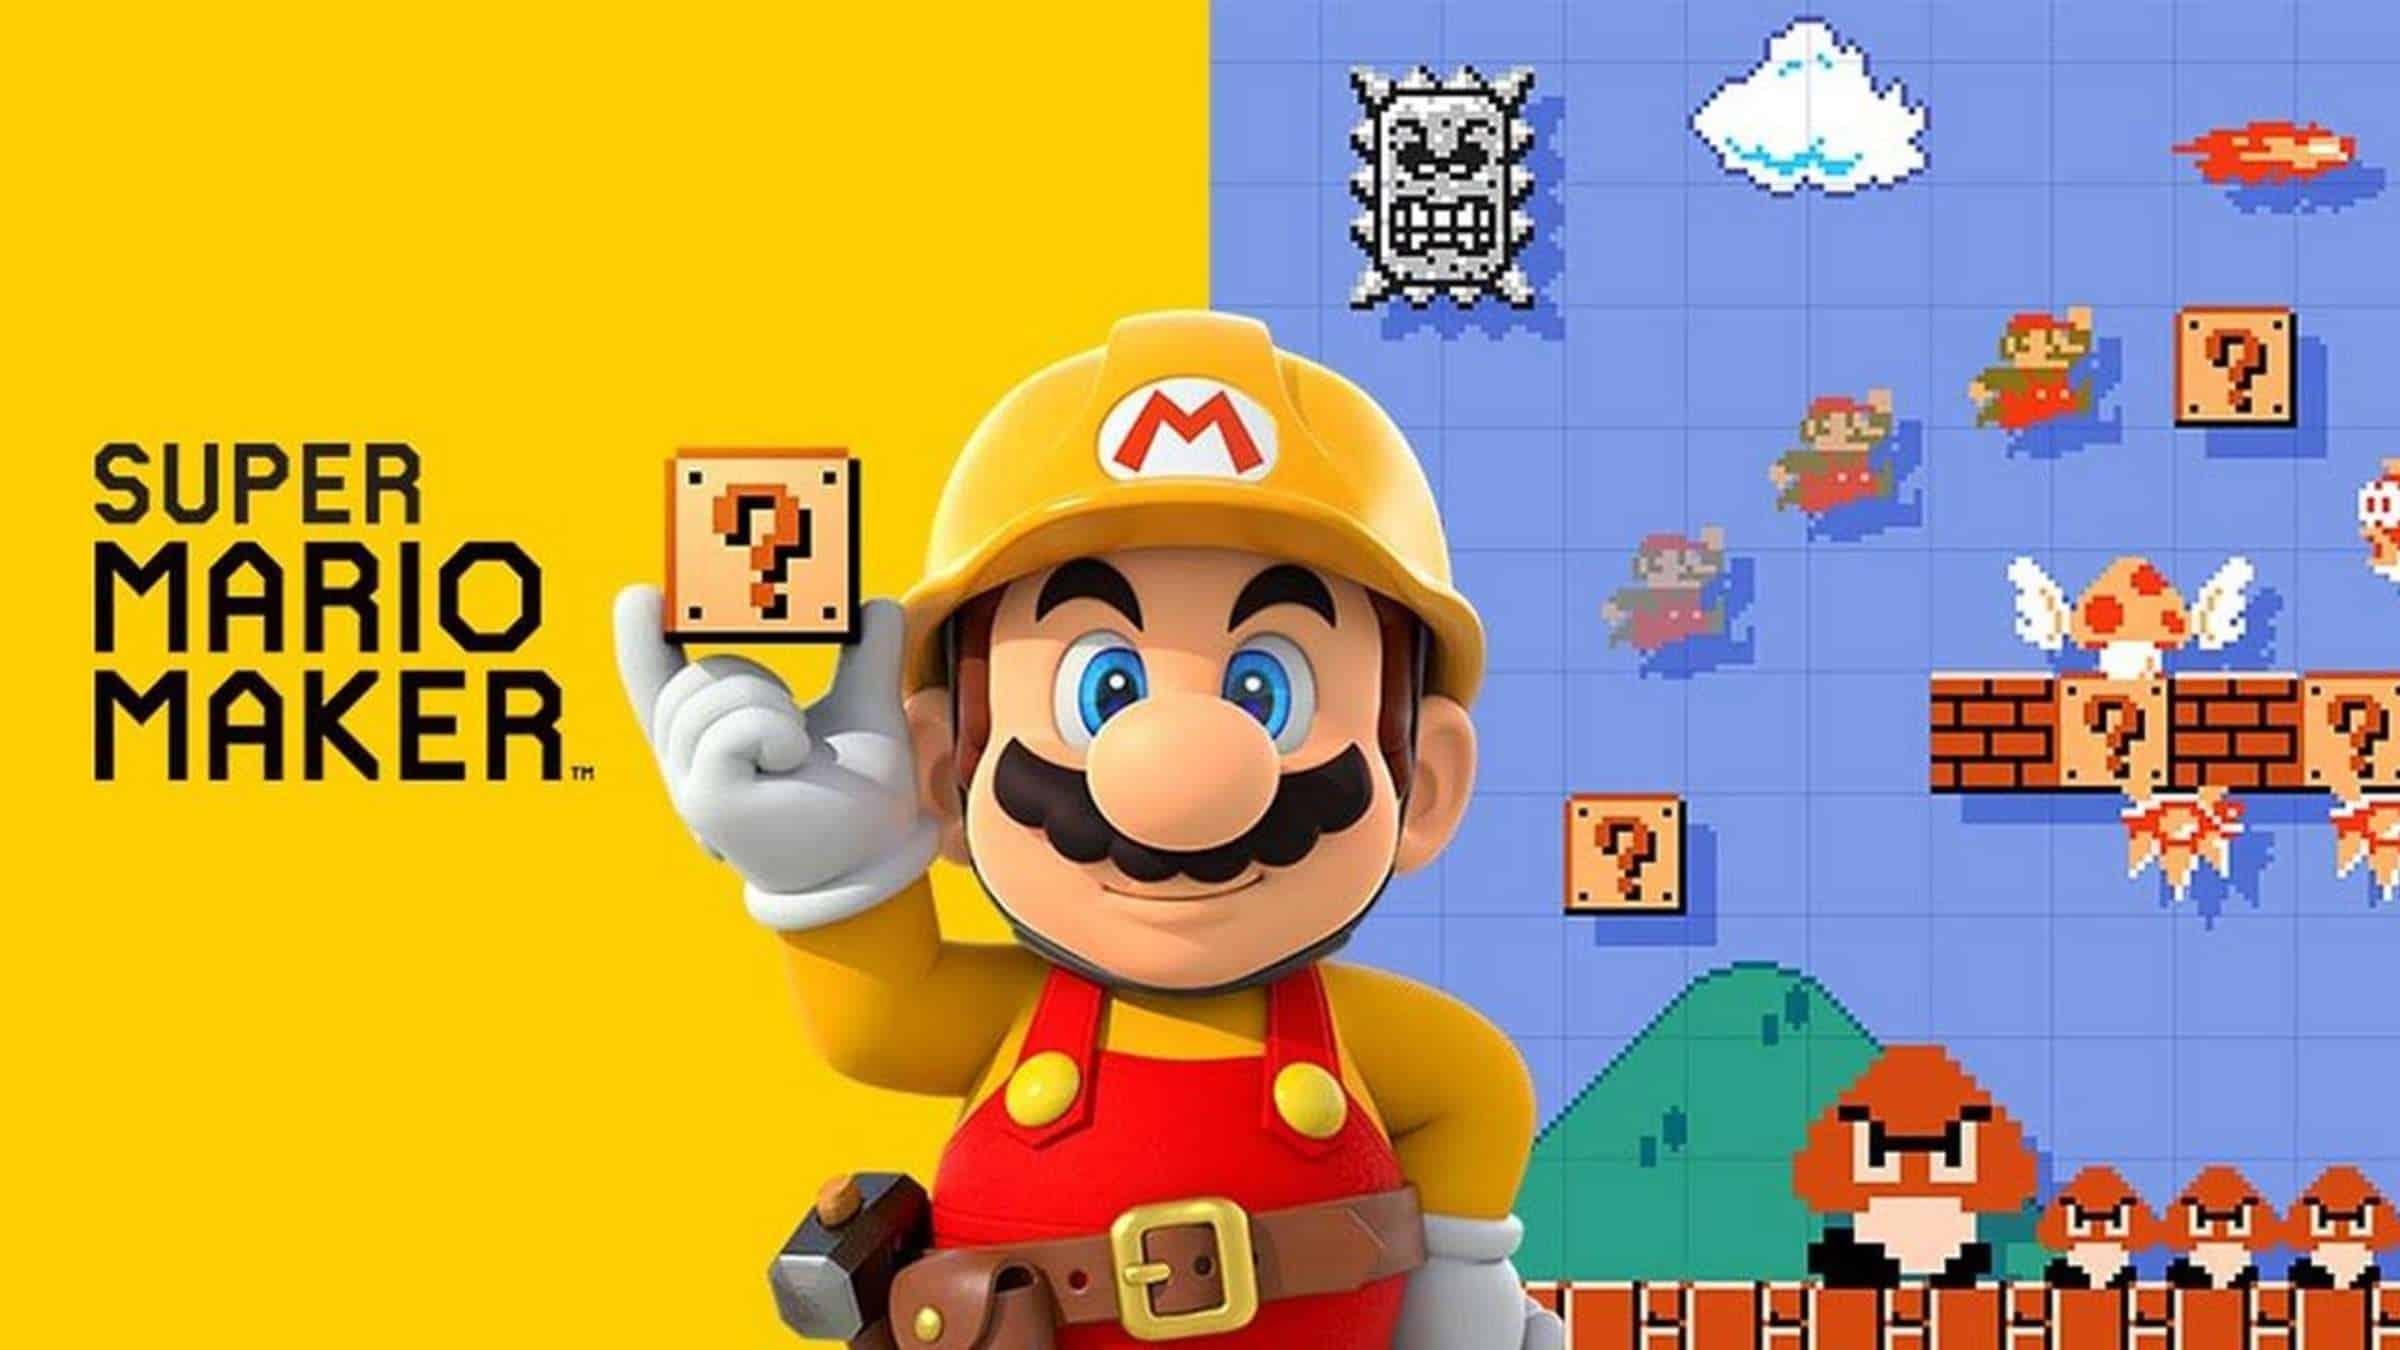 Best Super Mario Games - Super Mario Maker